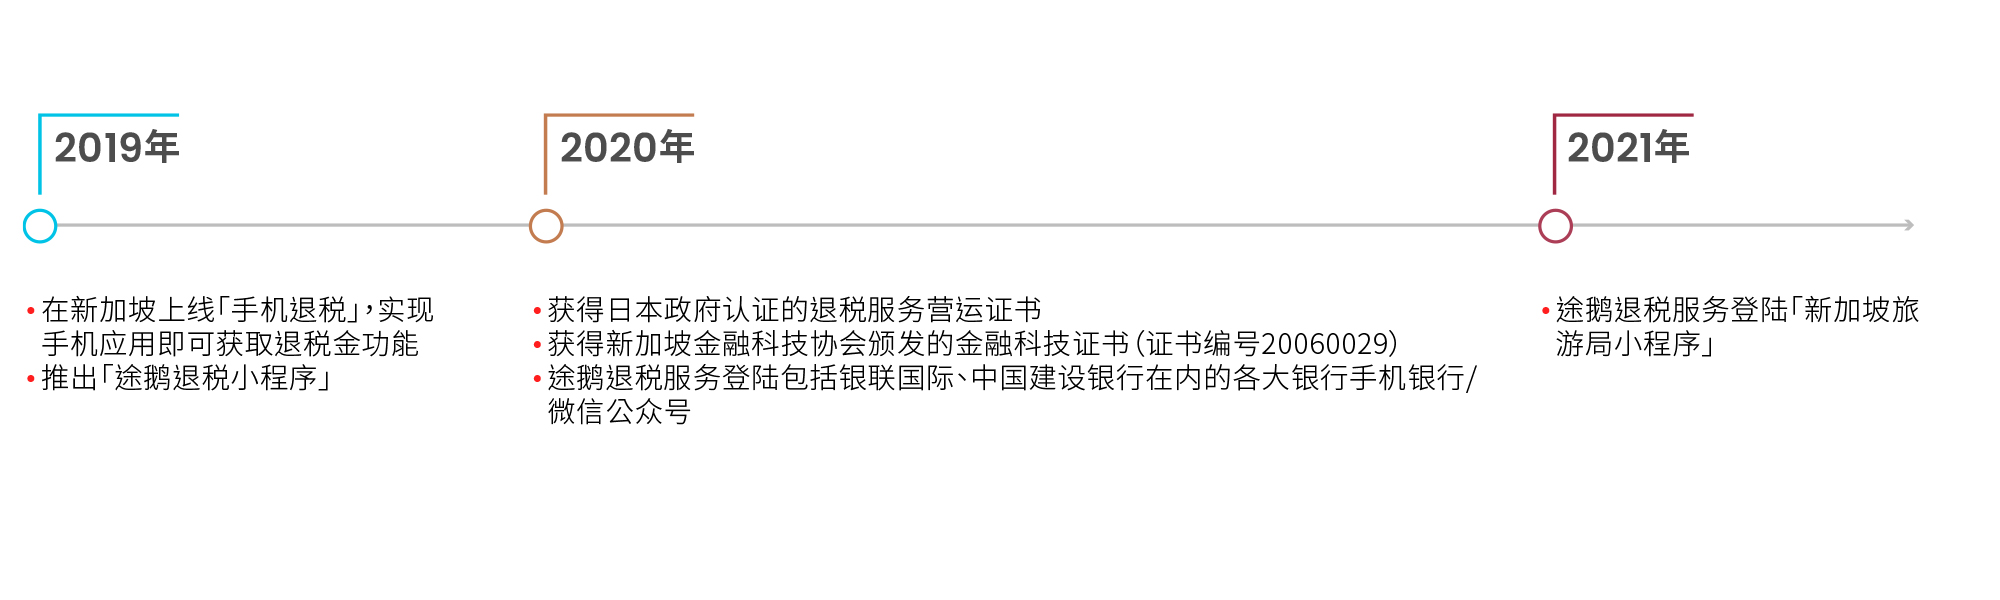 Milestone_chart_frame2_mandarin